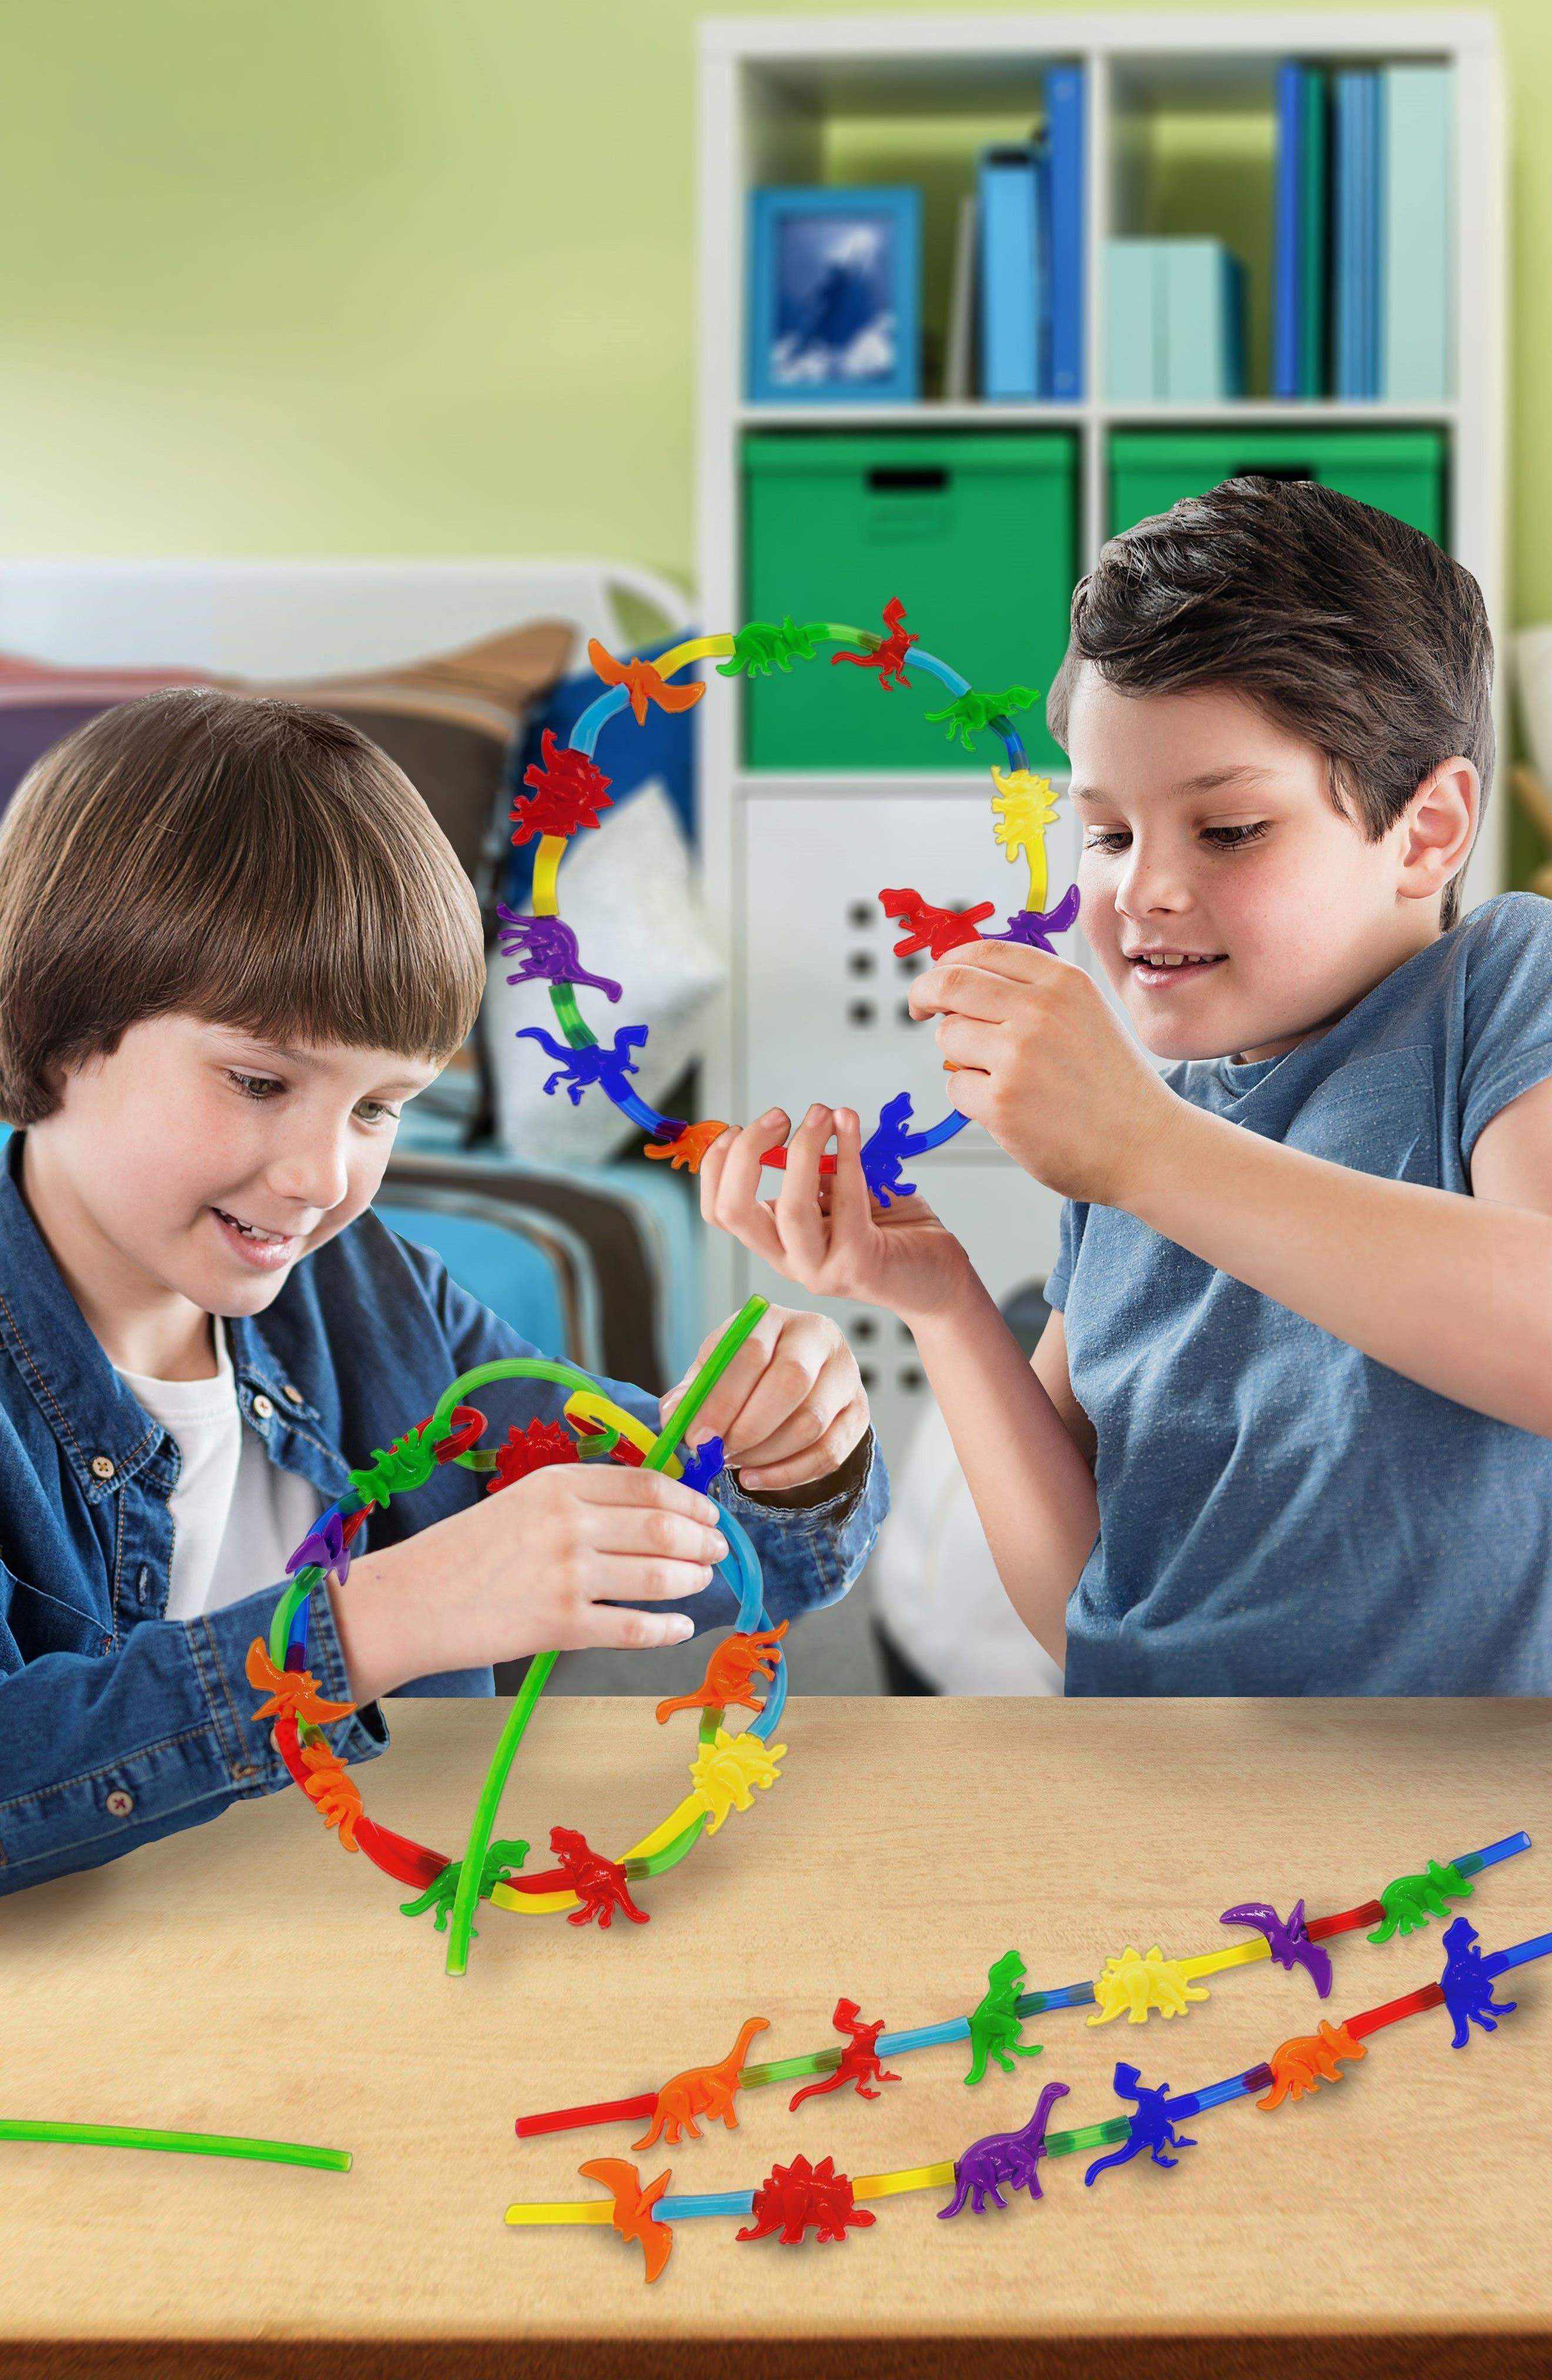 35-Piece Dinosaur Series Linking Toy Kit,                             Alternate thumbnail 3, color,